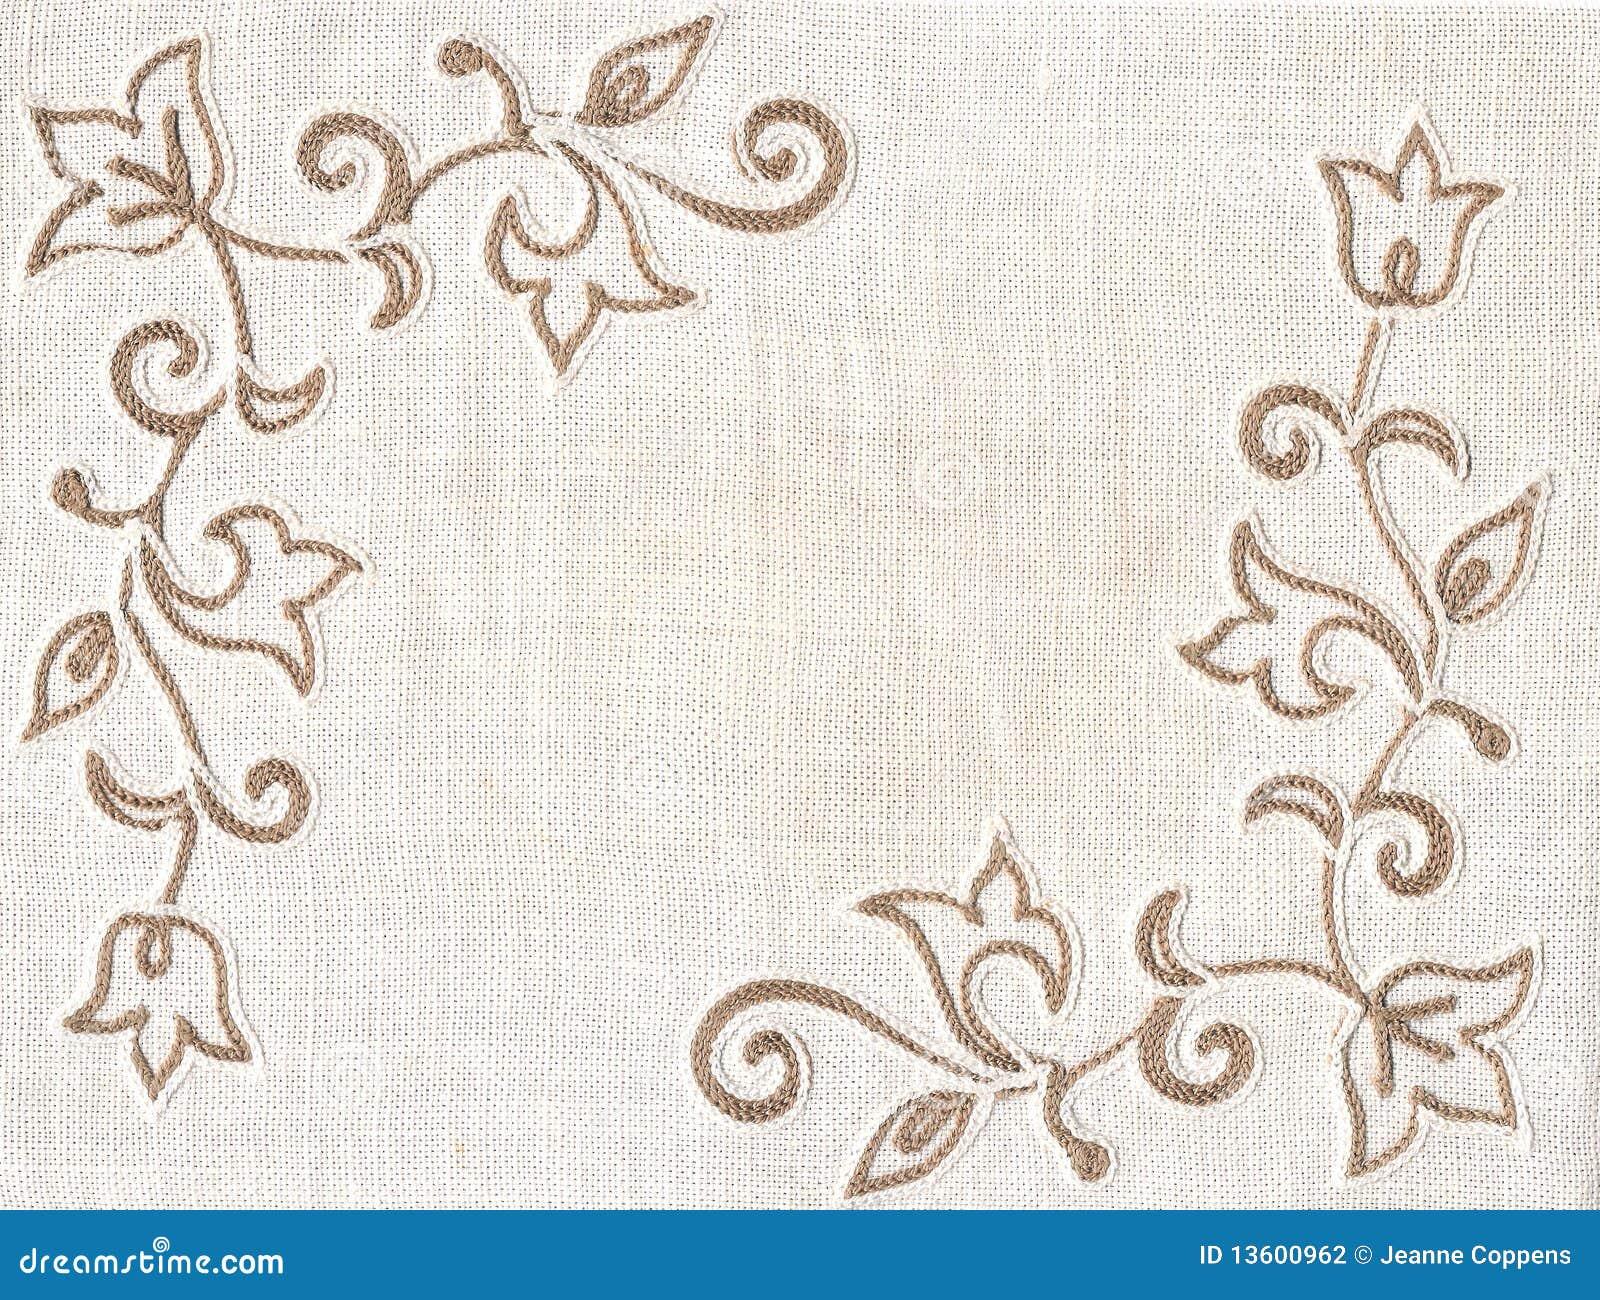 Fondo De La Materia Textil Del Bordado. Foto de archivo - Imagen de ...